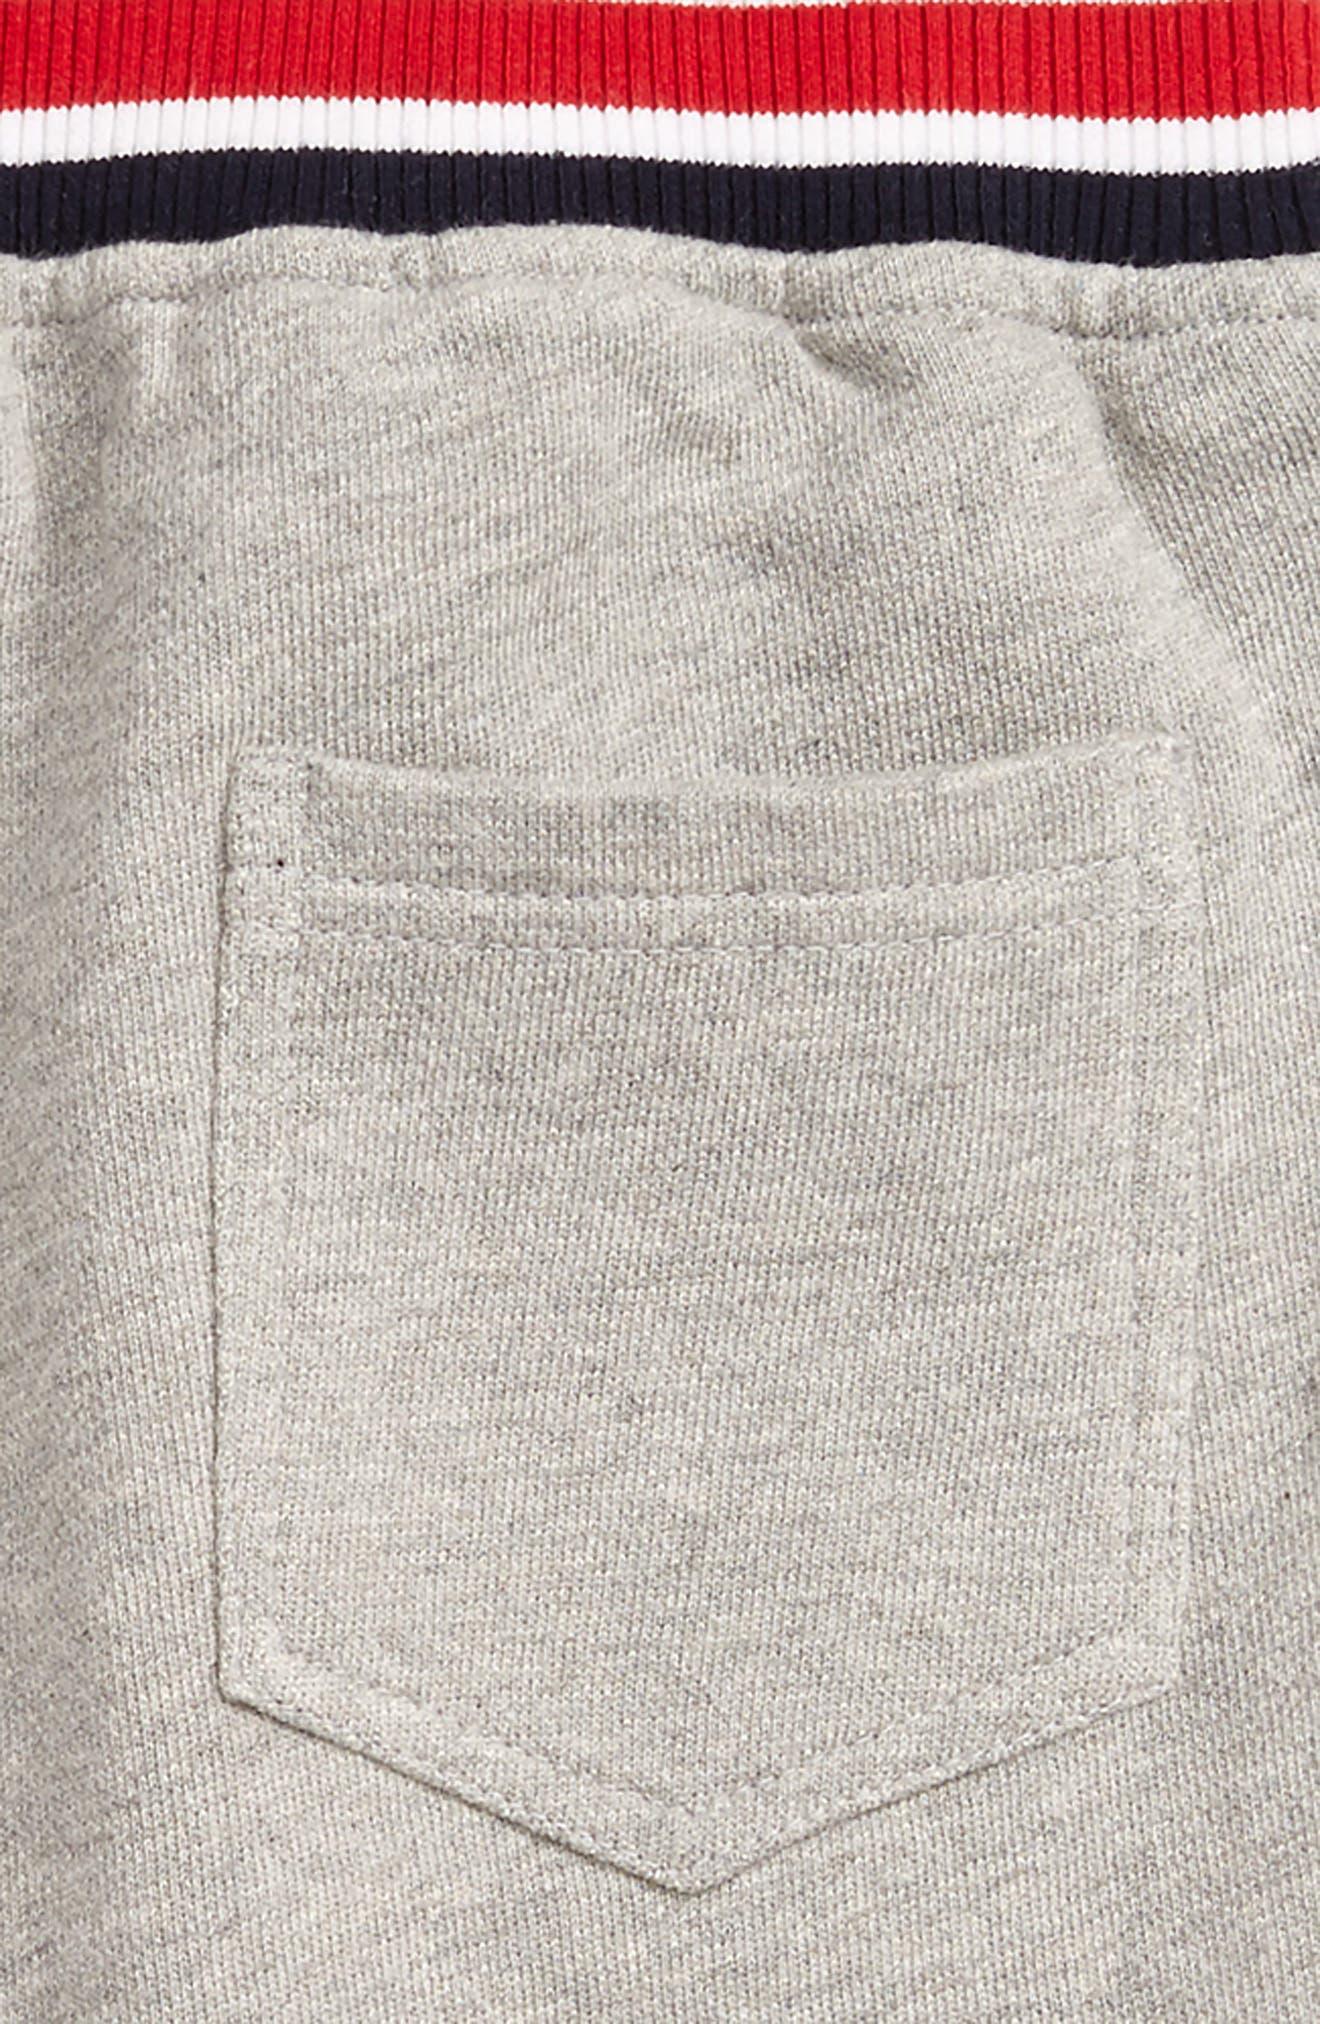 Alternate Image 3  - Peek Varsity Knit Shorts (Toddler Boys, Little Boys & Big Boys)